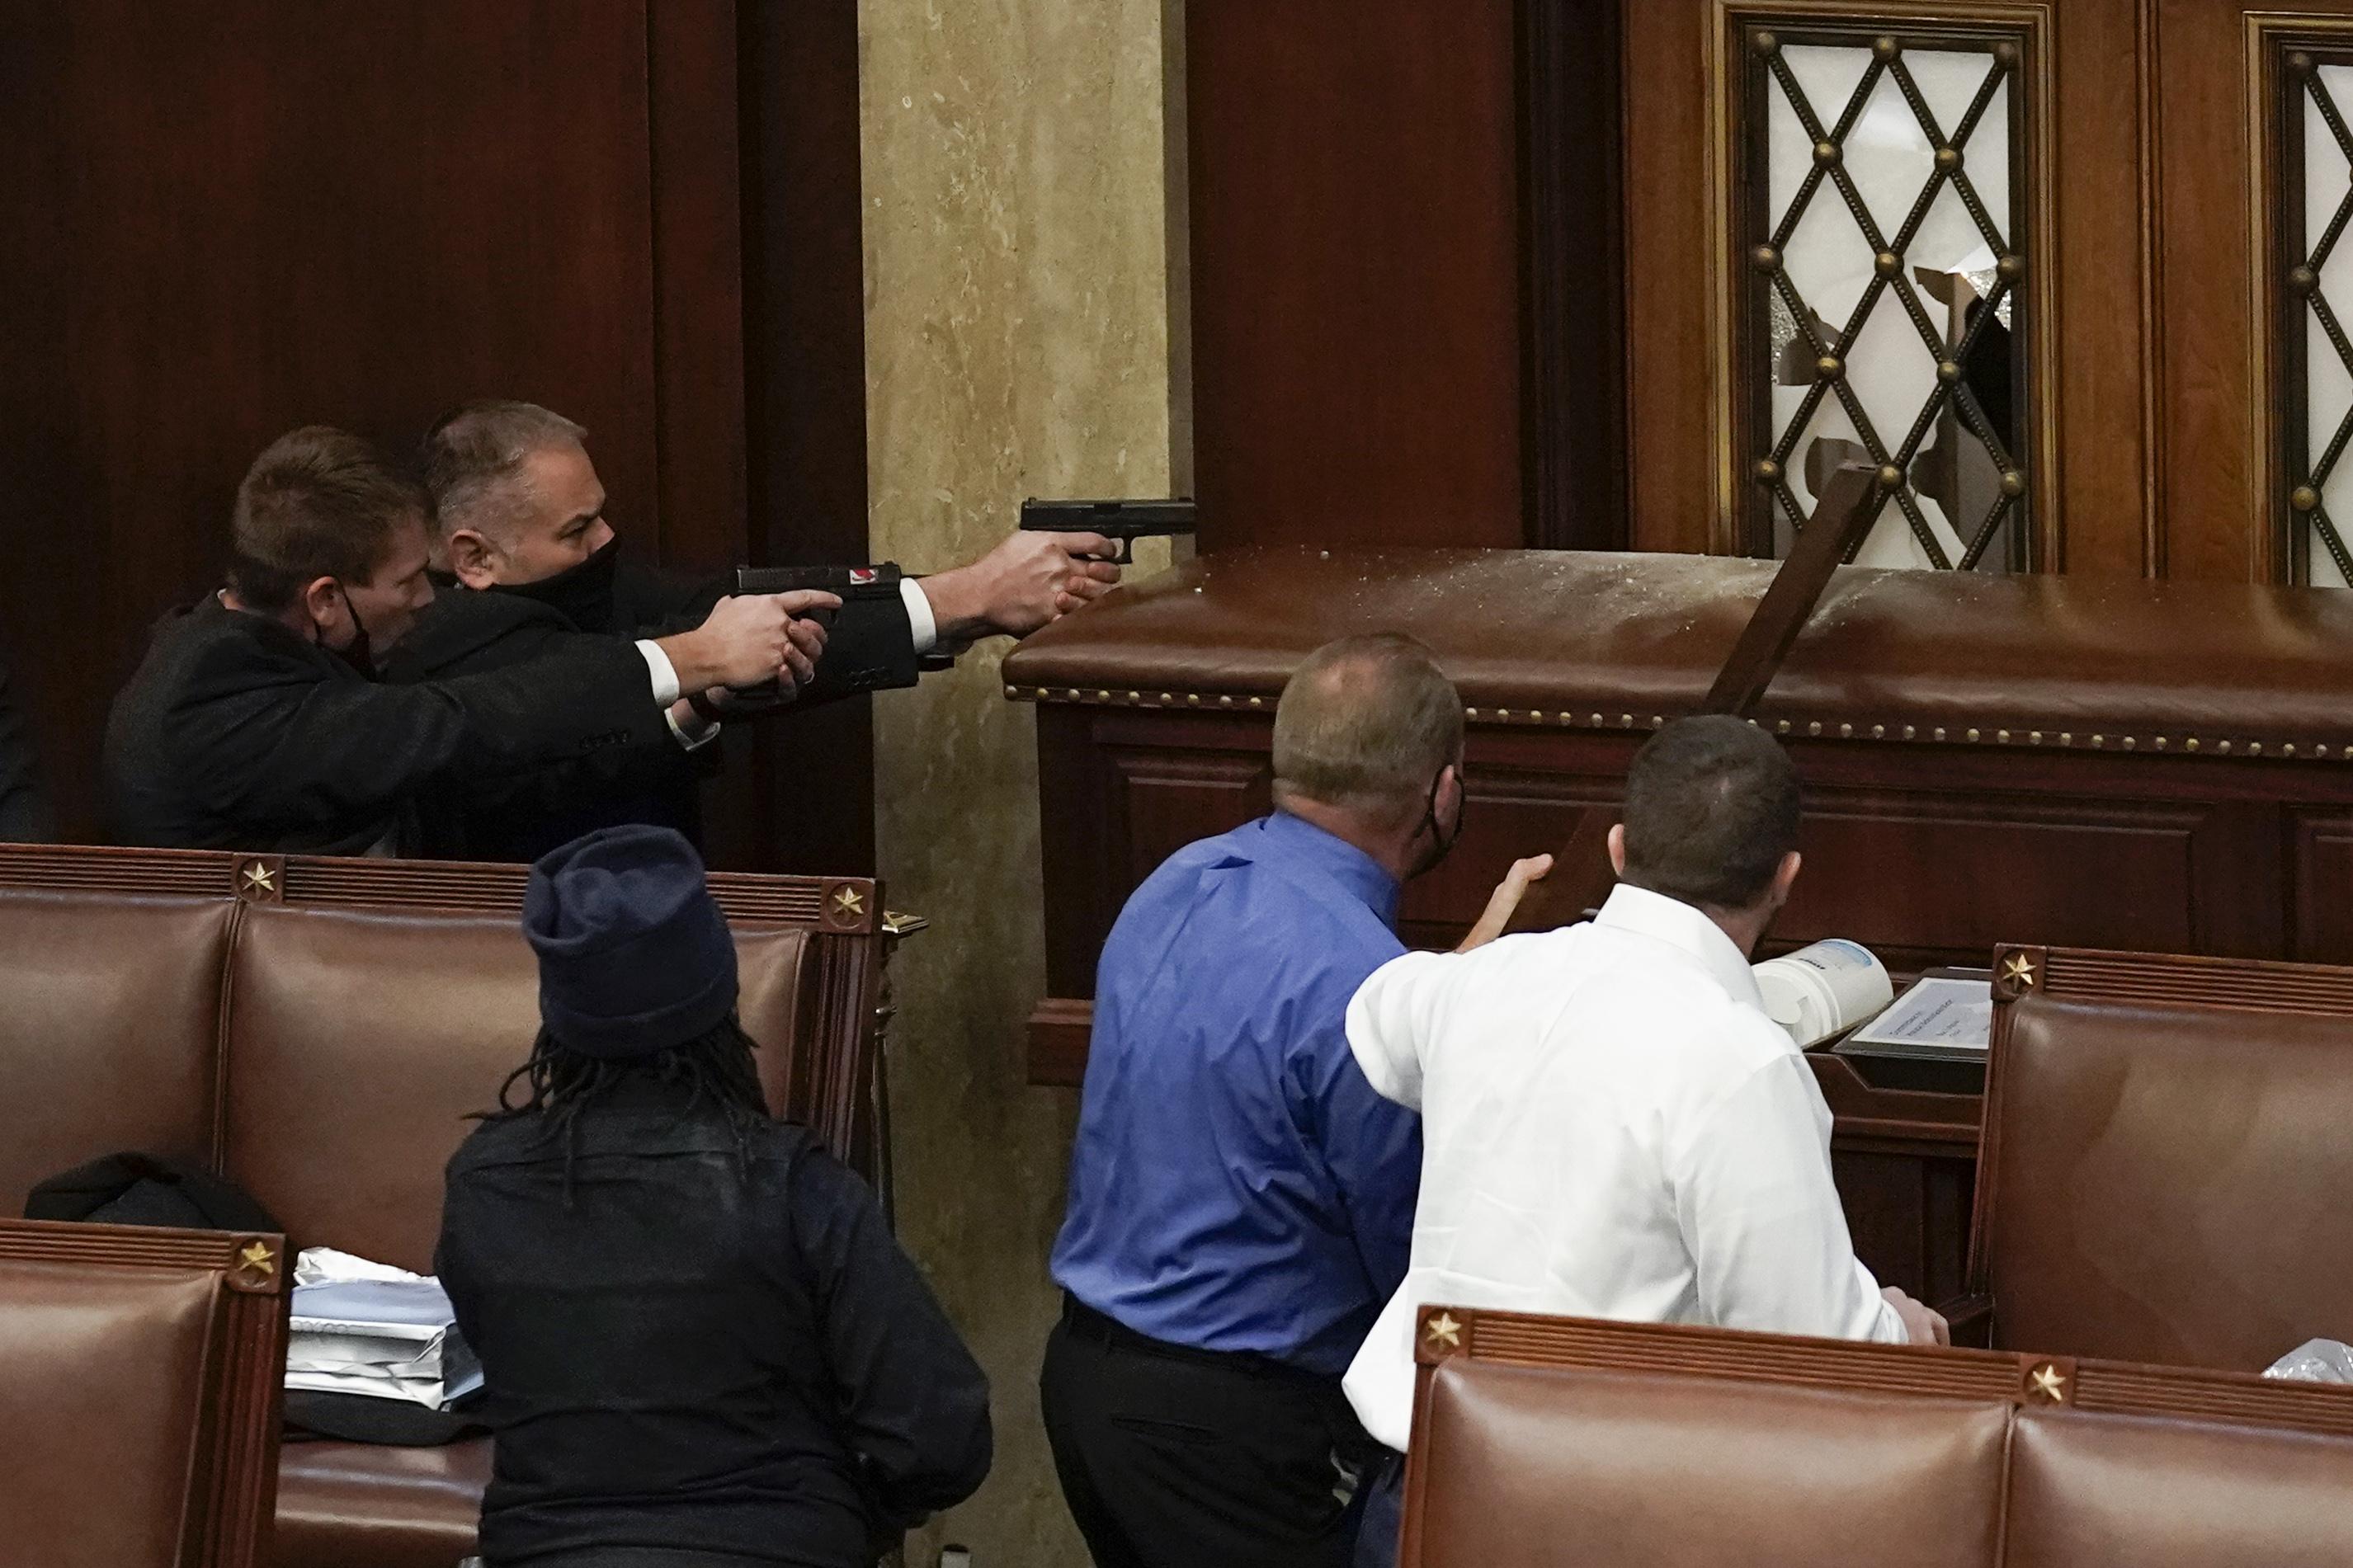 U.S. Capitol protest: A history of shootings, violent attacks at D.C. building